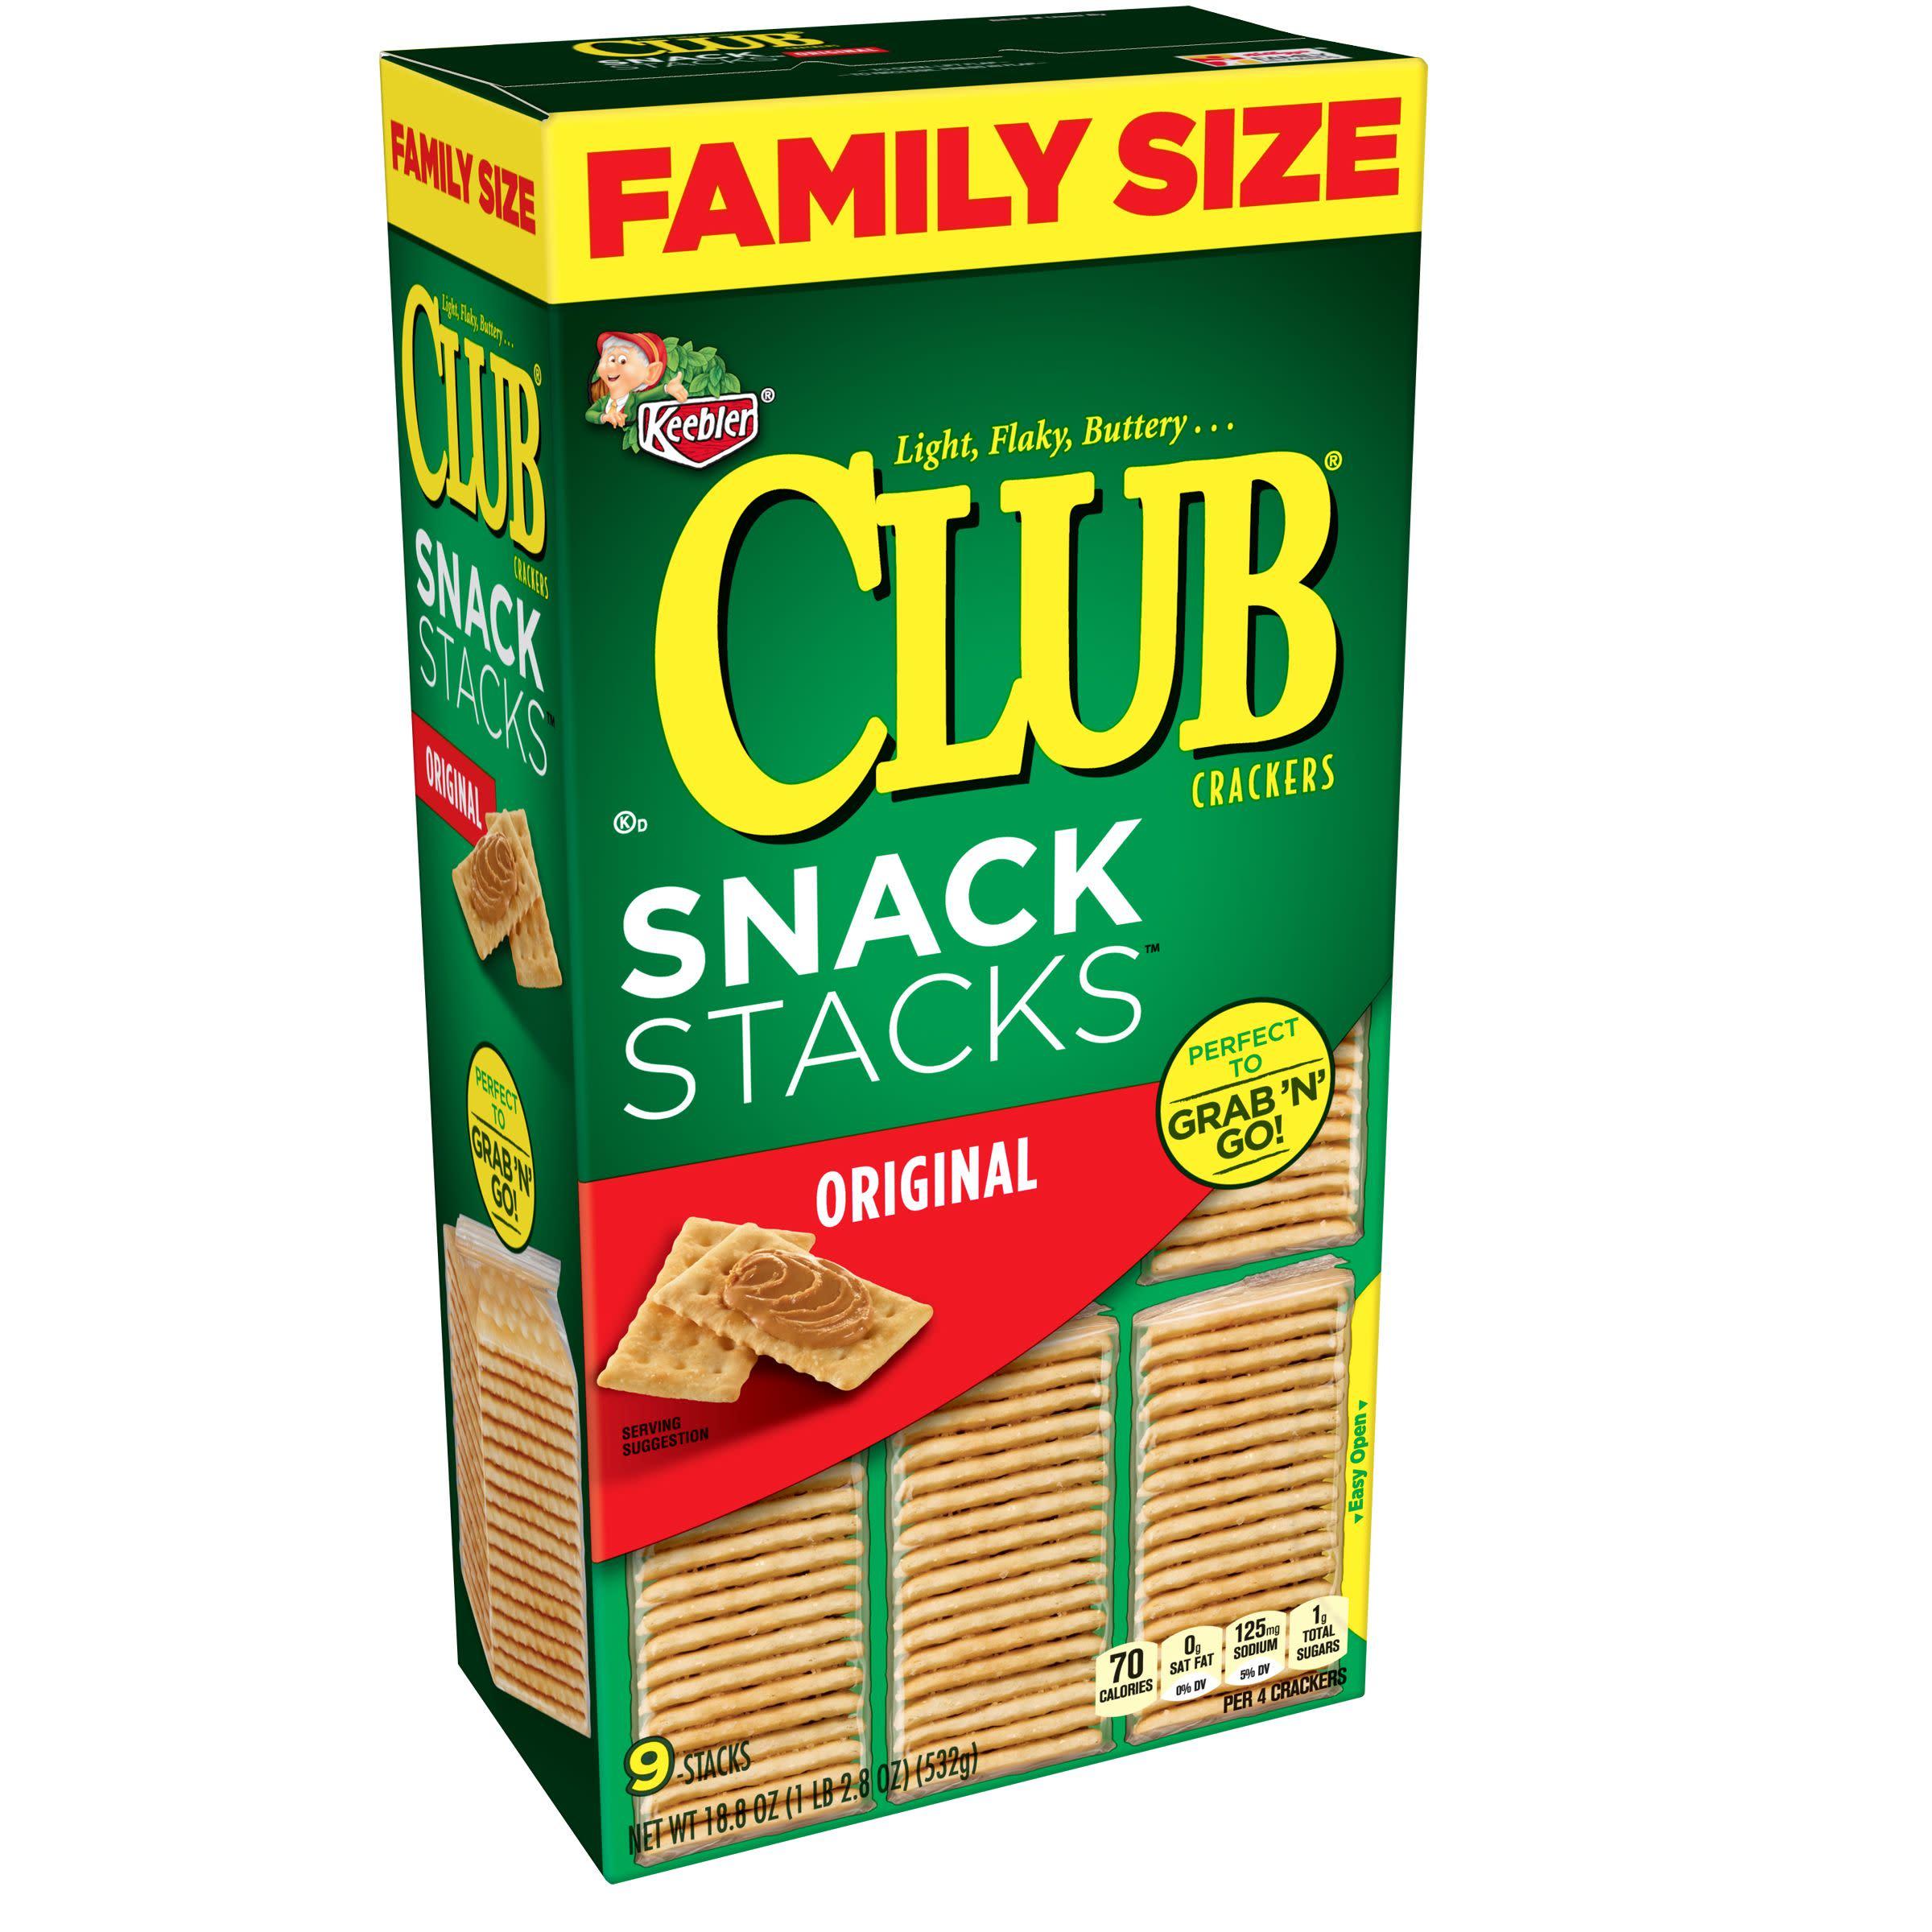 Keebler Club Snack Stacks Original Crackers, 18.8 Oz.